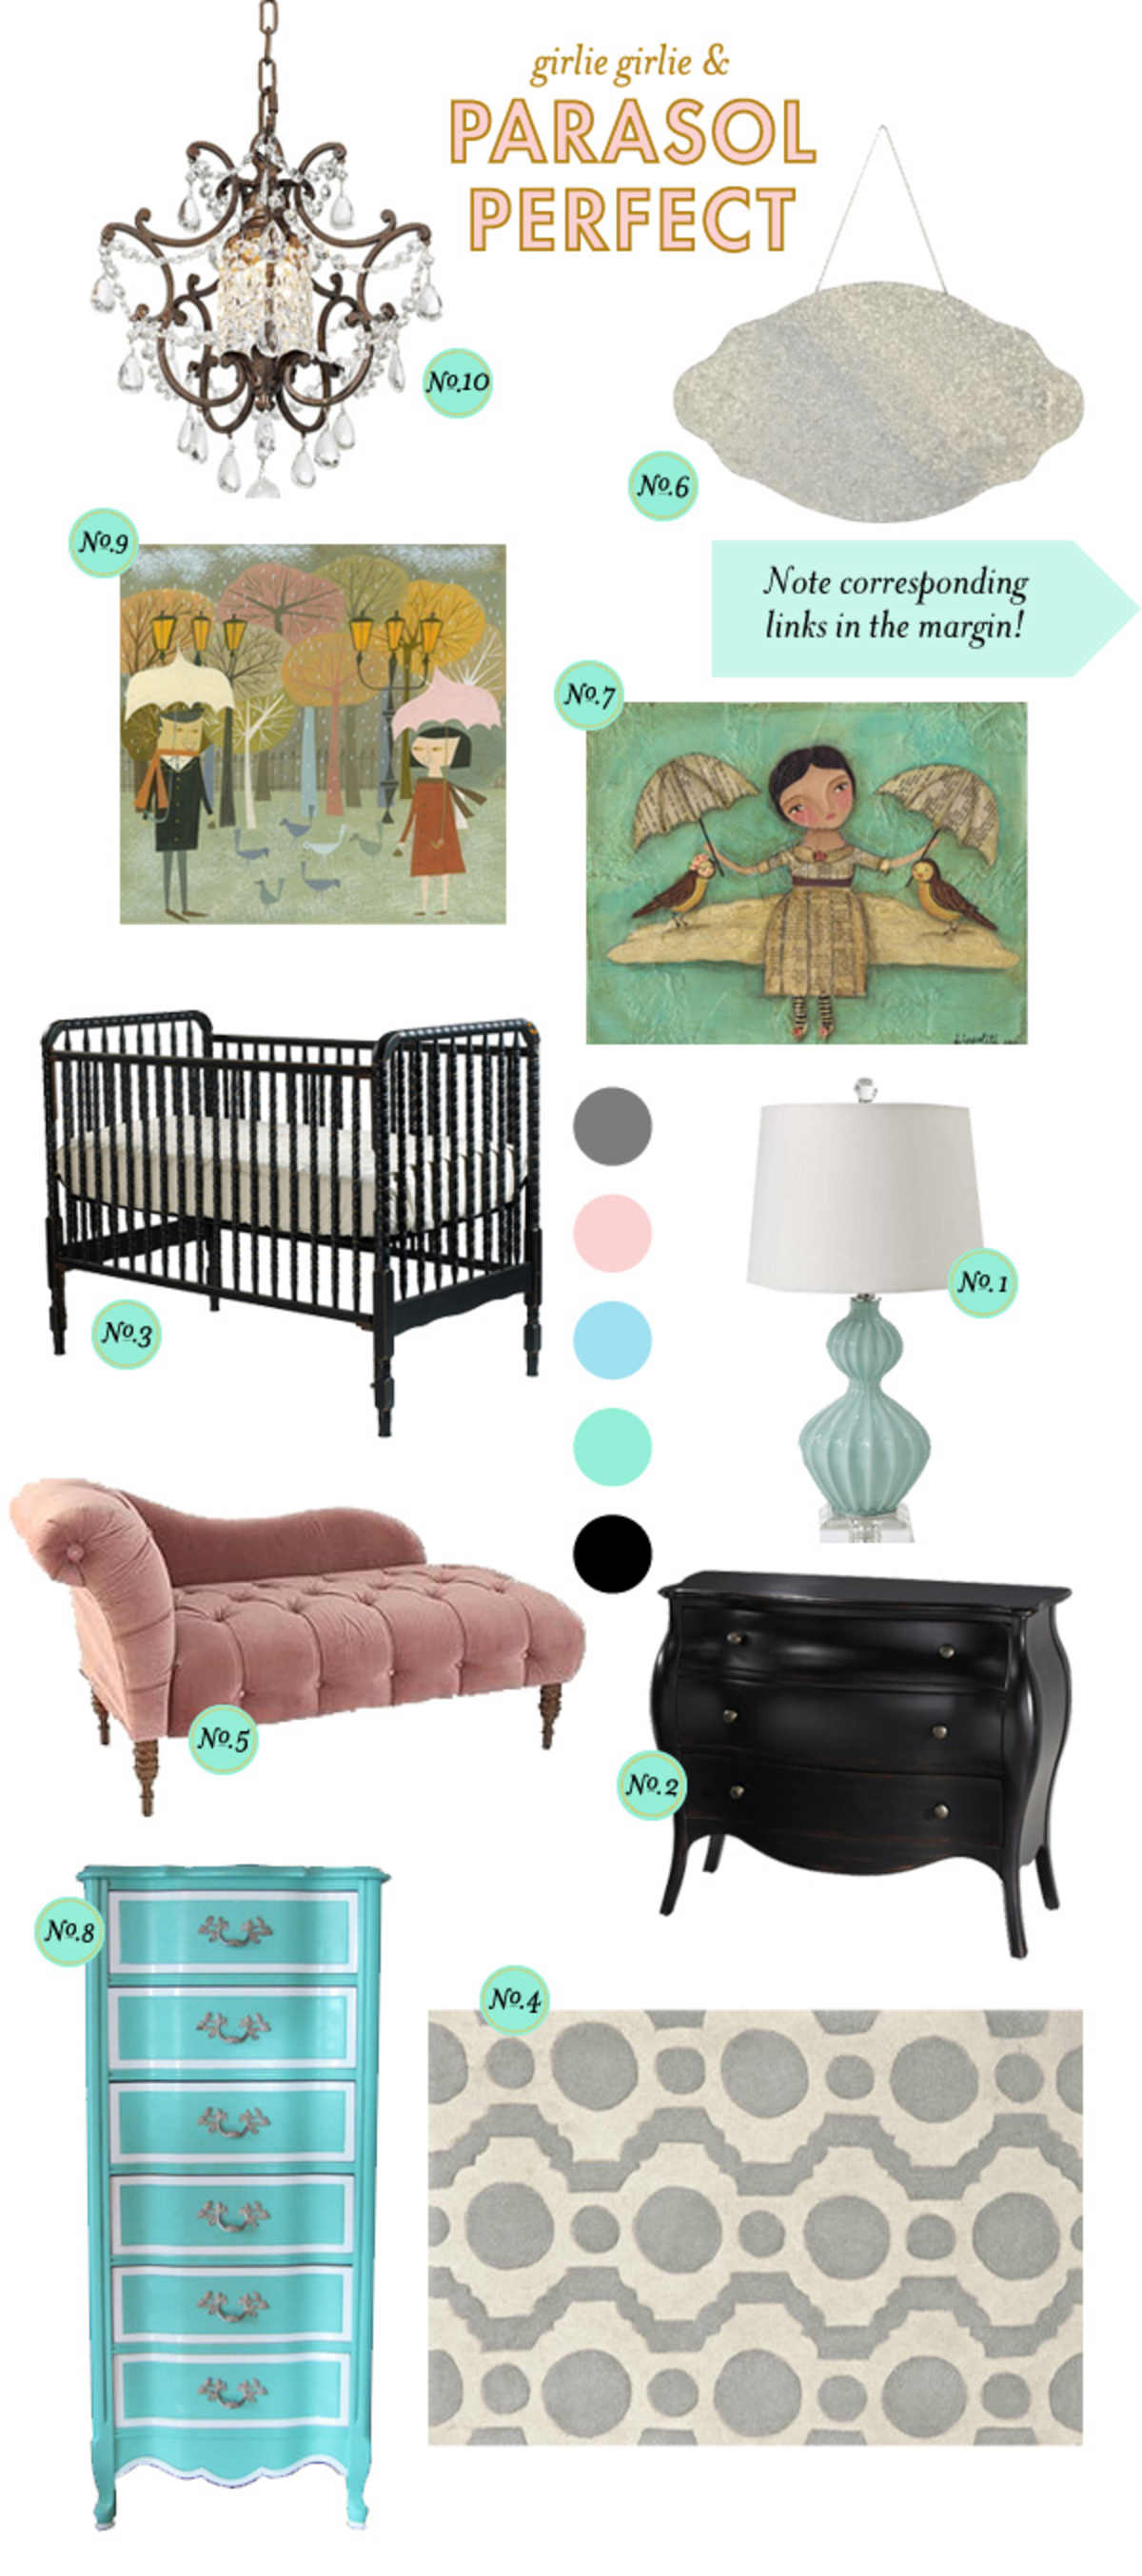 Baby Nursery Inspiration ; Baby Girl Nursery Inspiration ; Nursery Inspiration Board